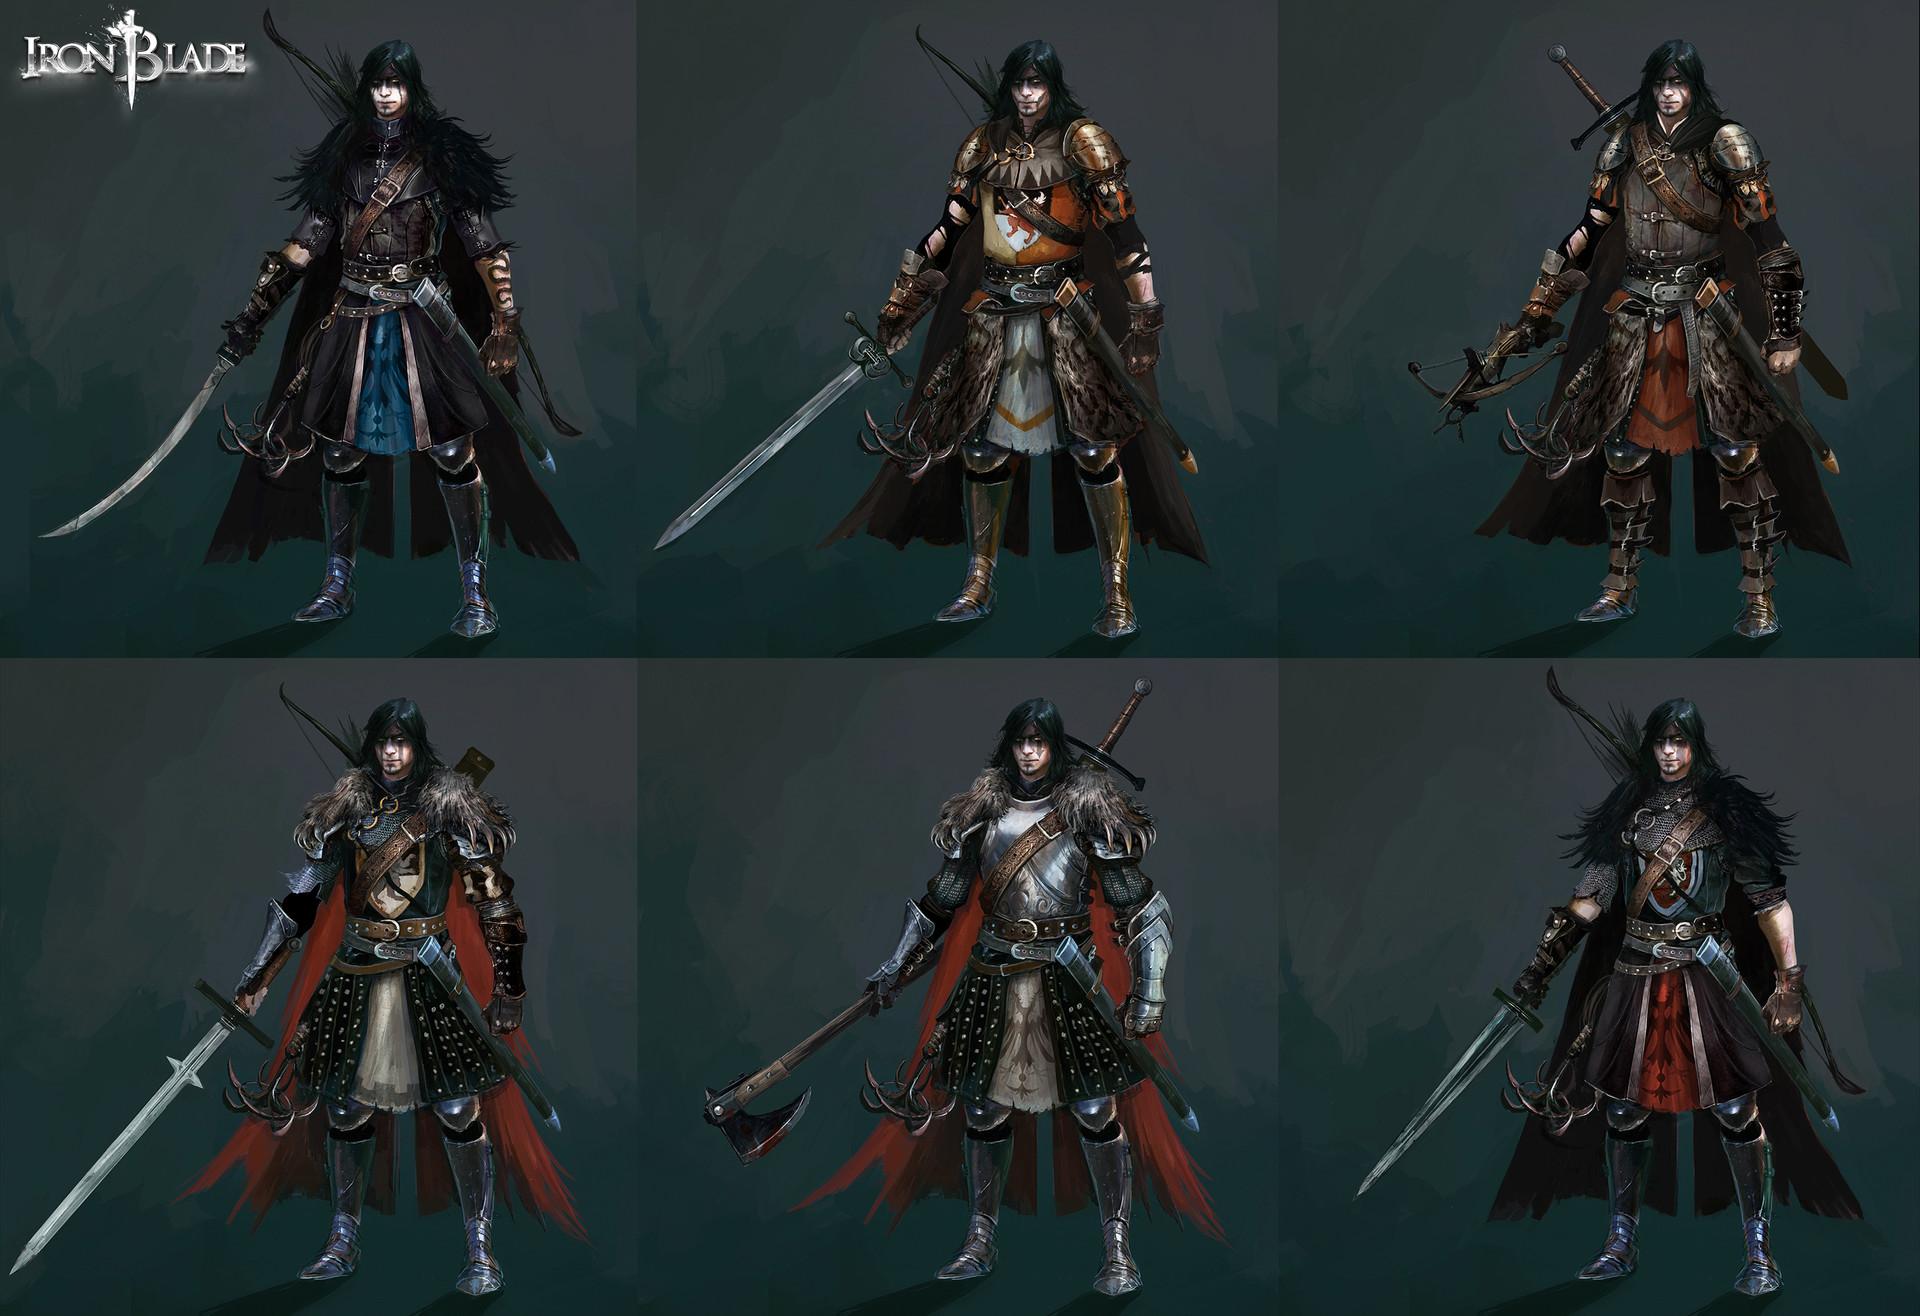 Alexandre chaudret hf armorset armors01